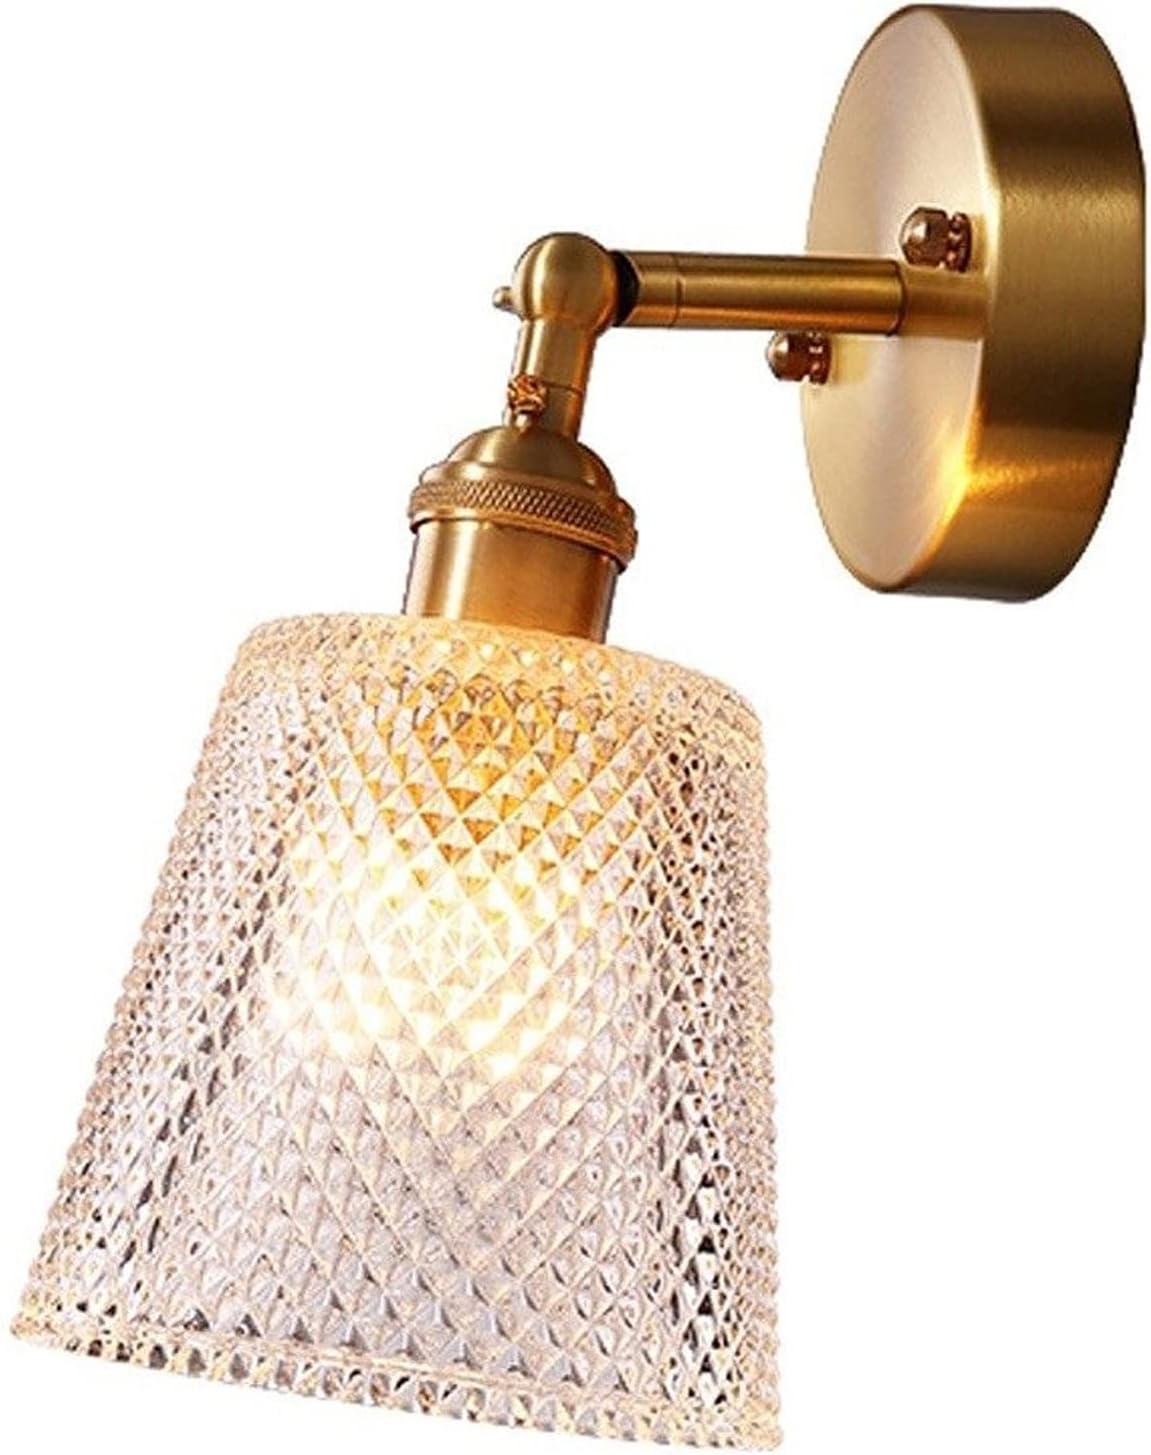 Outstanding GUCOTGUQ Modern Copper Glass Ball Sacramento Mall Wall Lamp Wa Gold Sconce